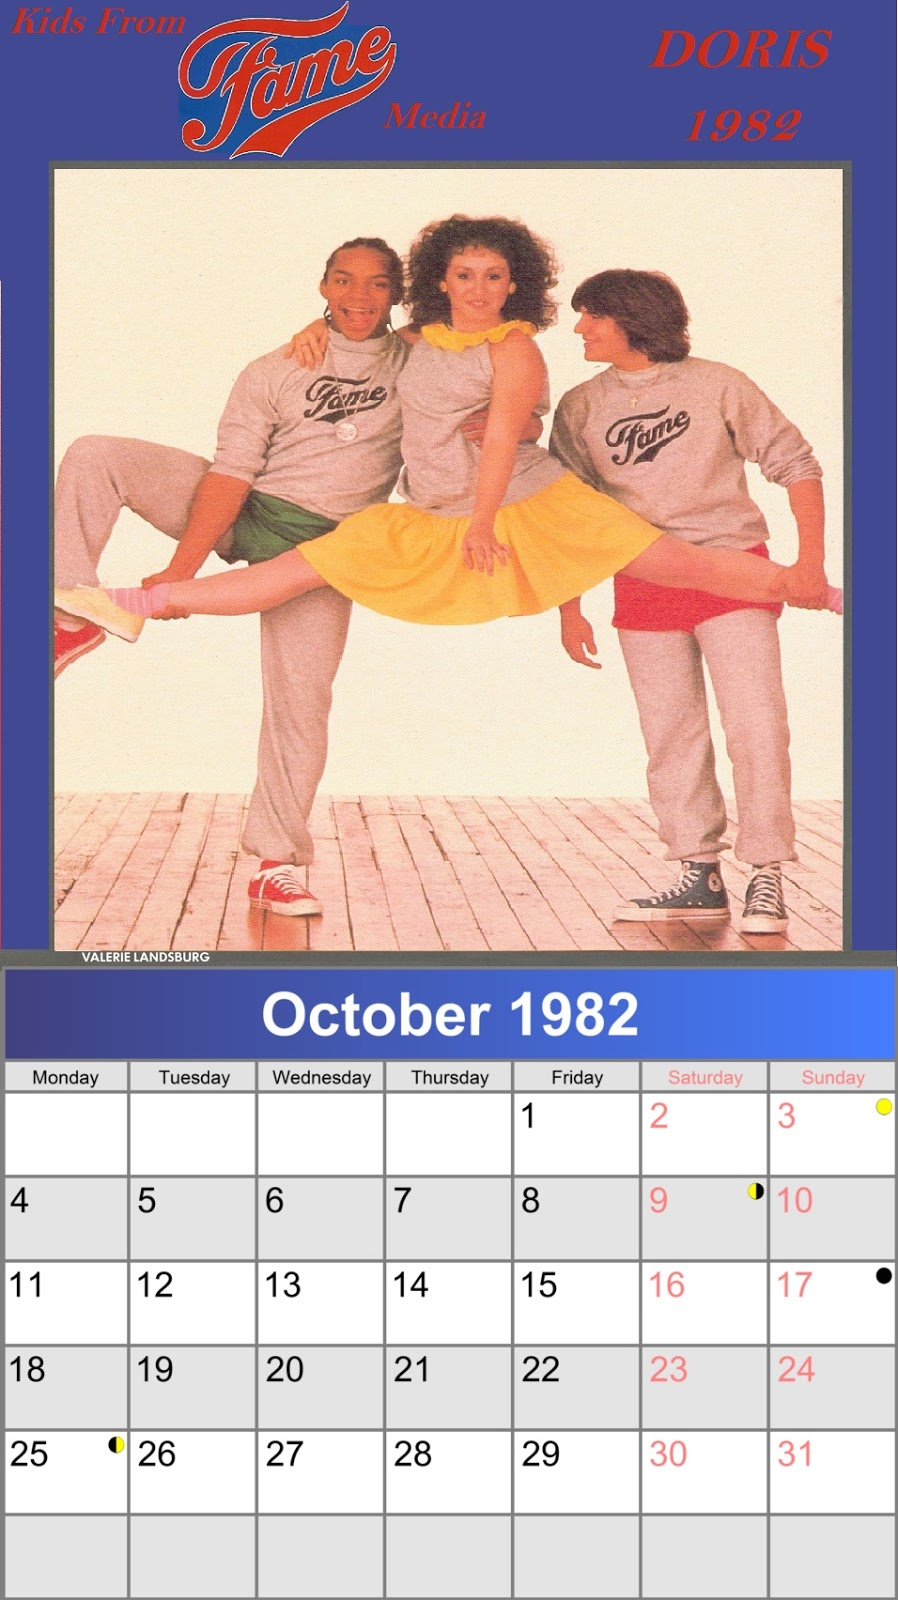 1982 Calendar Telugu.Kids From Fame Media Doris 1982 Calendar